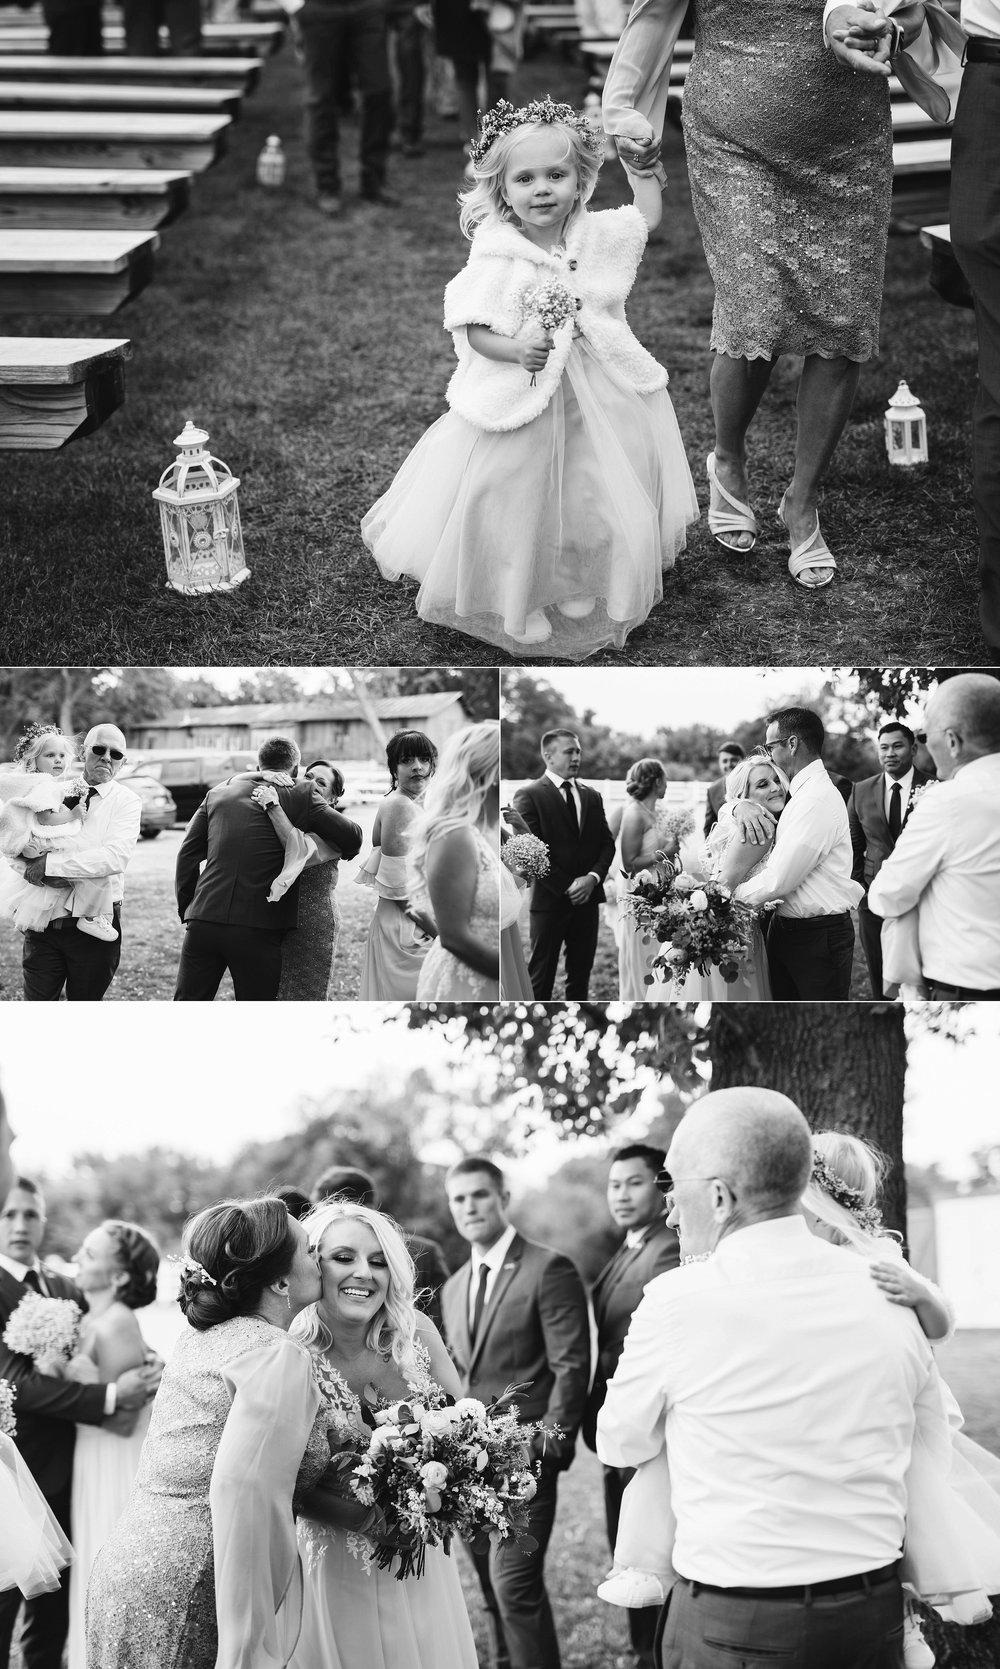 john-p-furber-farm-wedding-in-september-blush-and-coral-flowers-134.jpg